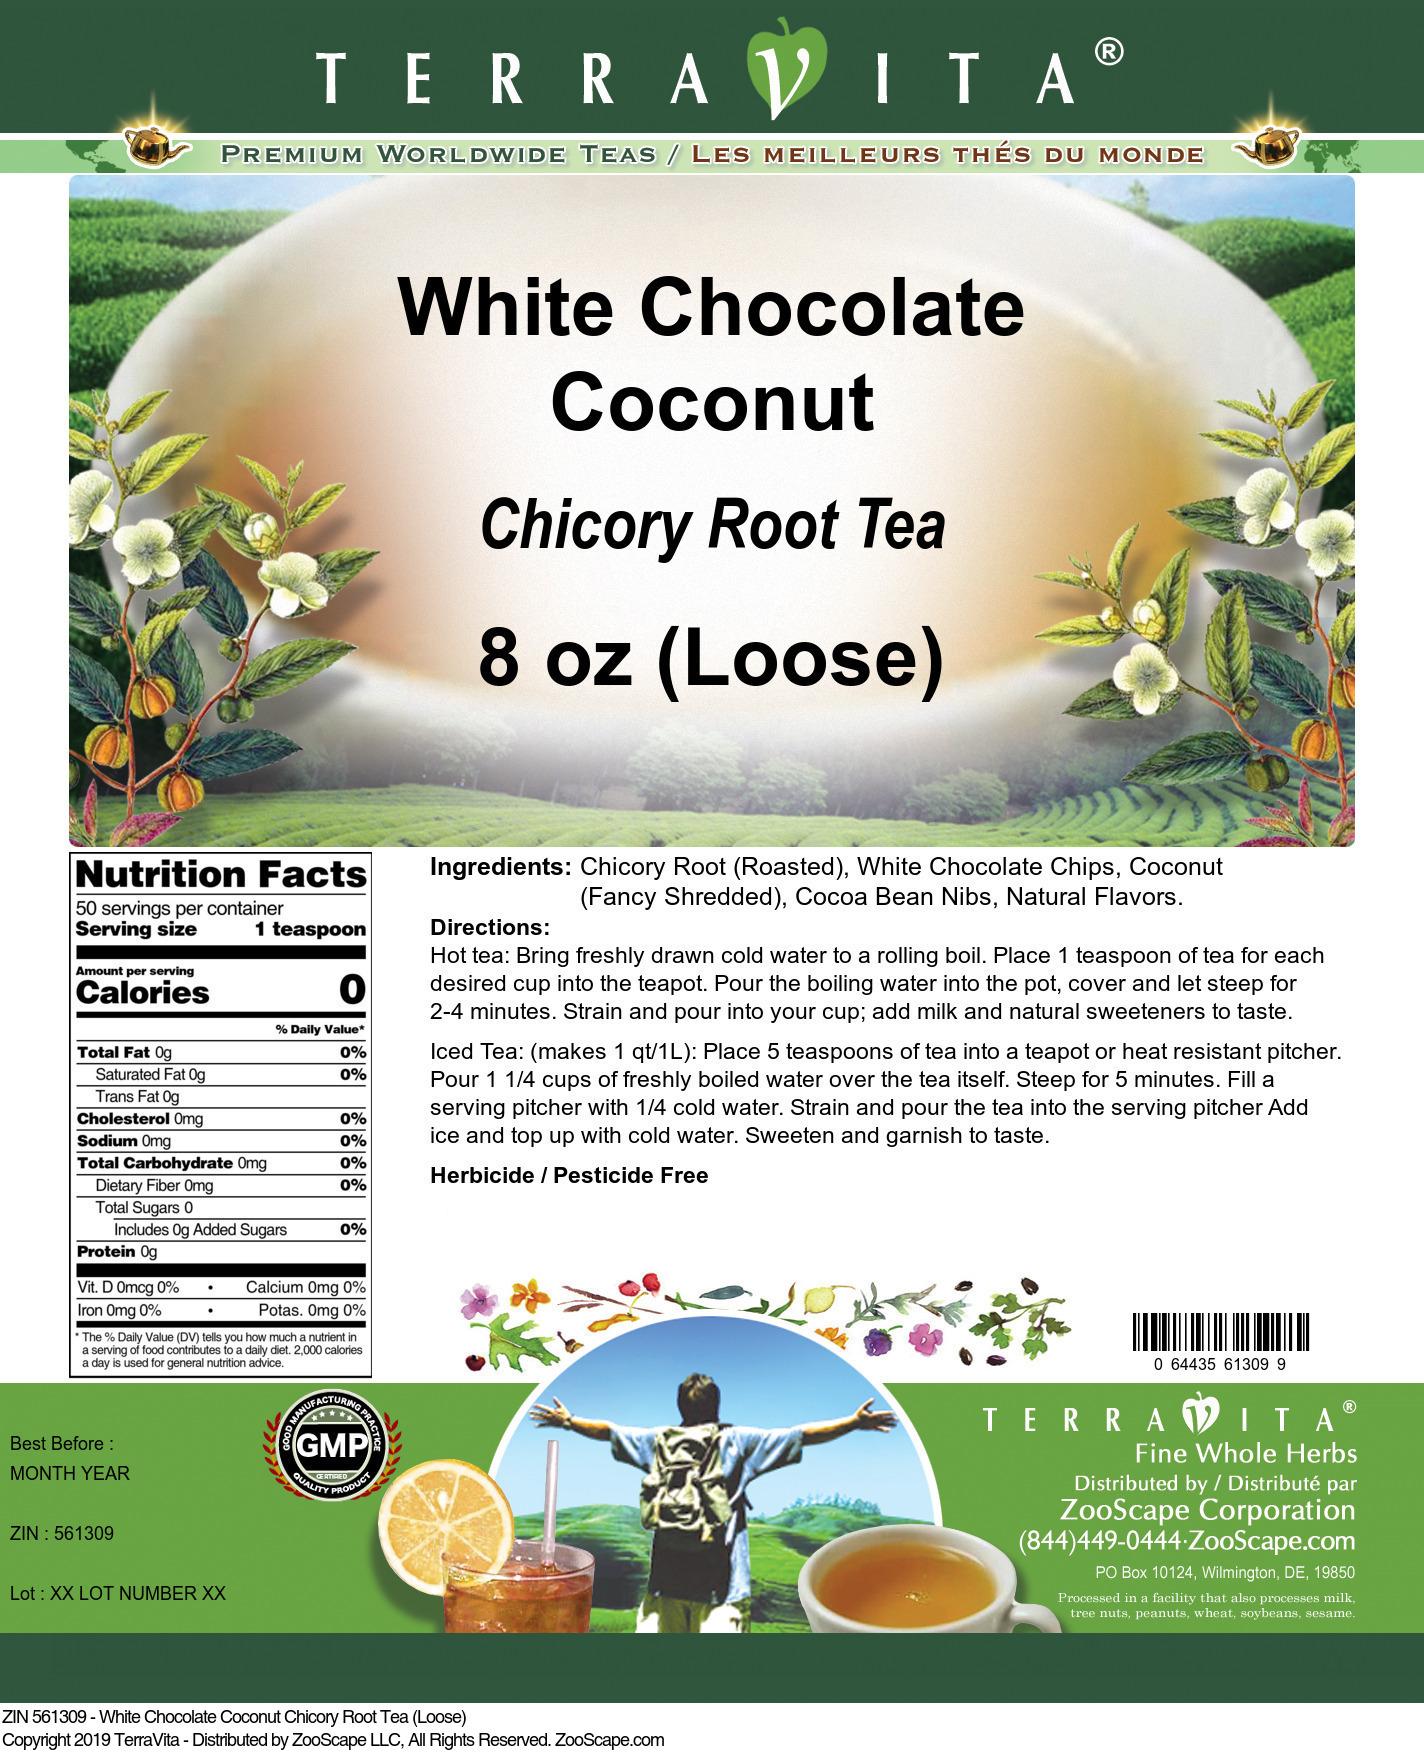 White Chocolate Coconut Chicory Root Tea (Loose)